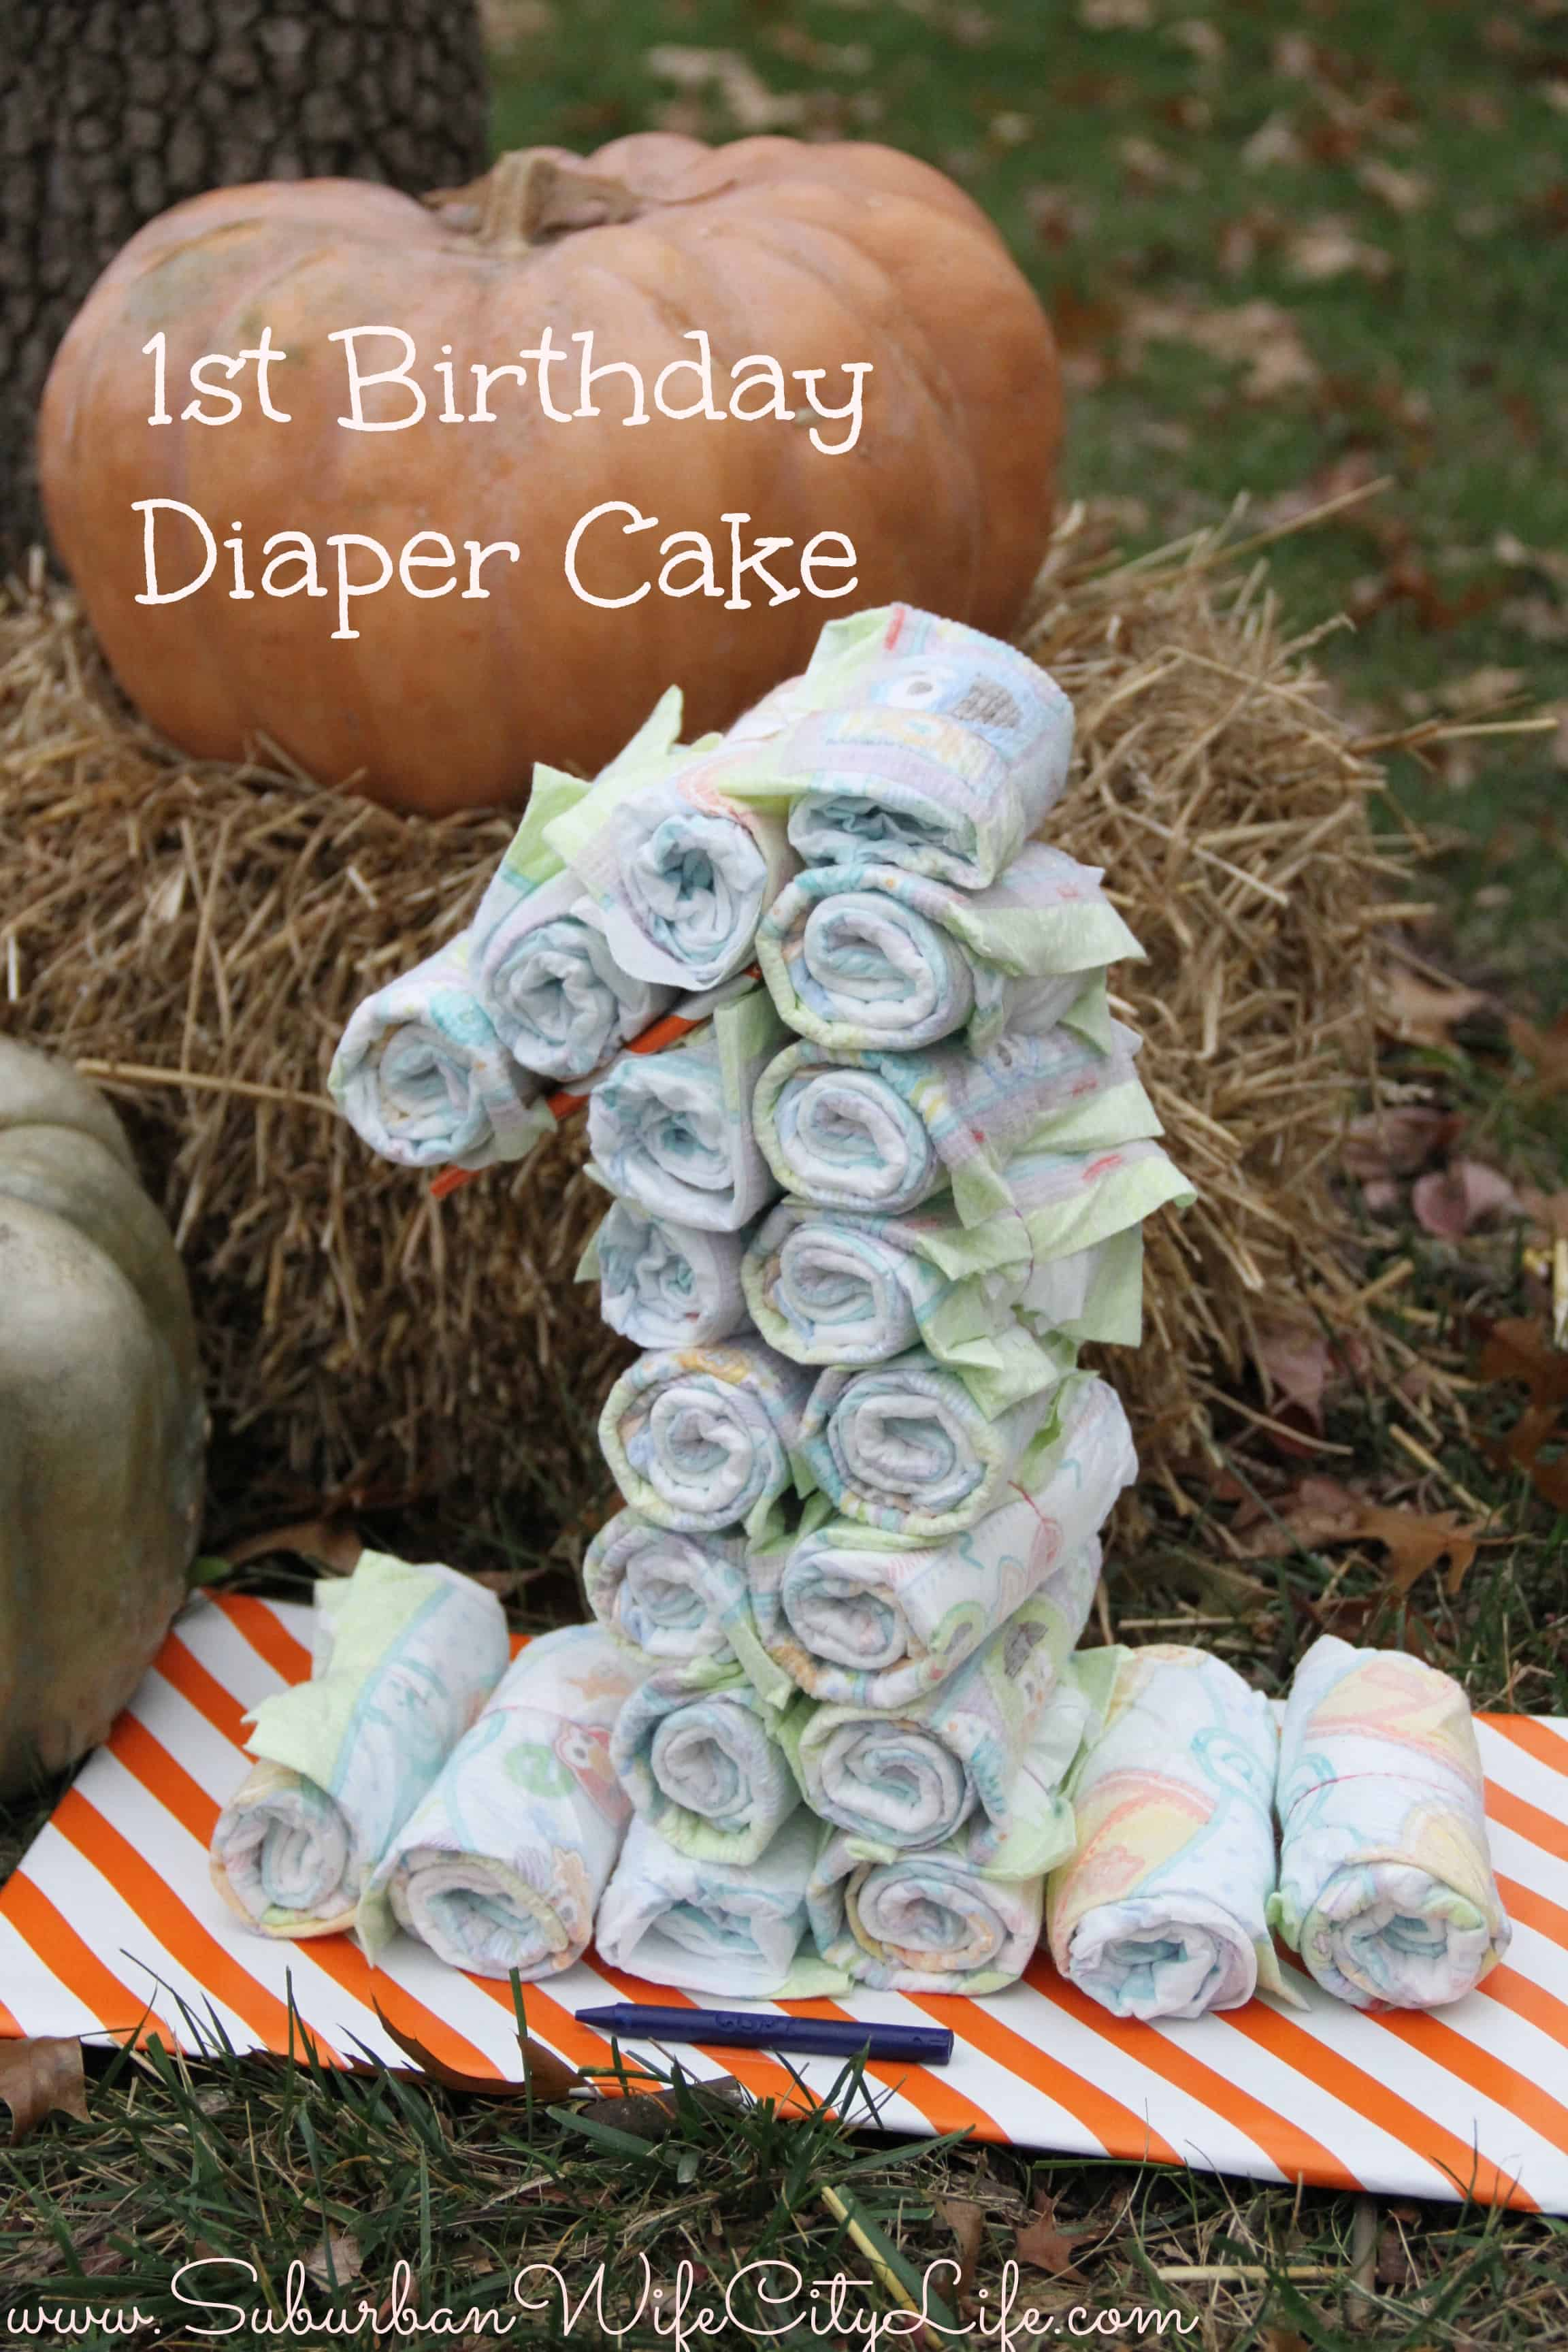 1st Birthday Diaper Cake